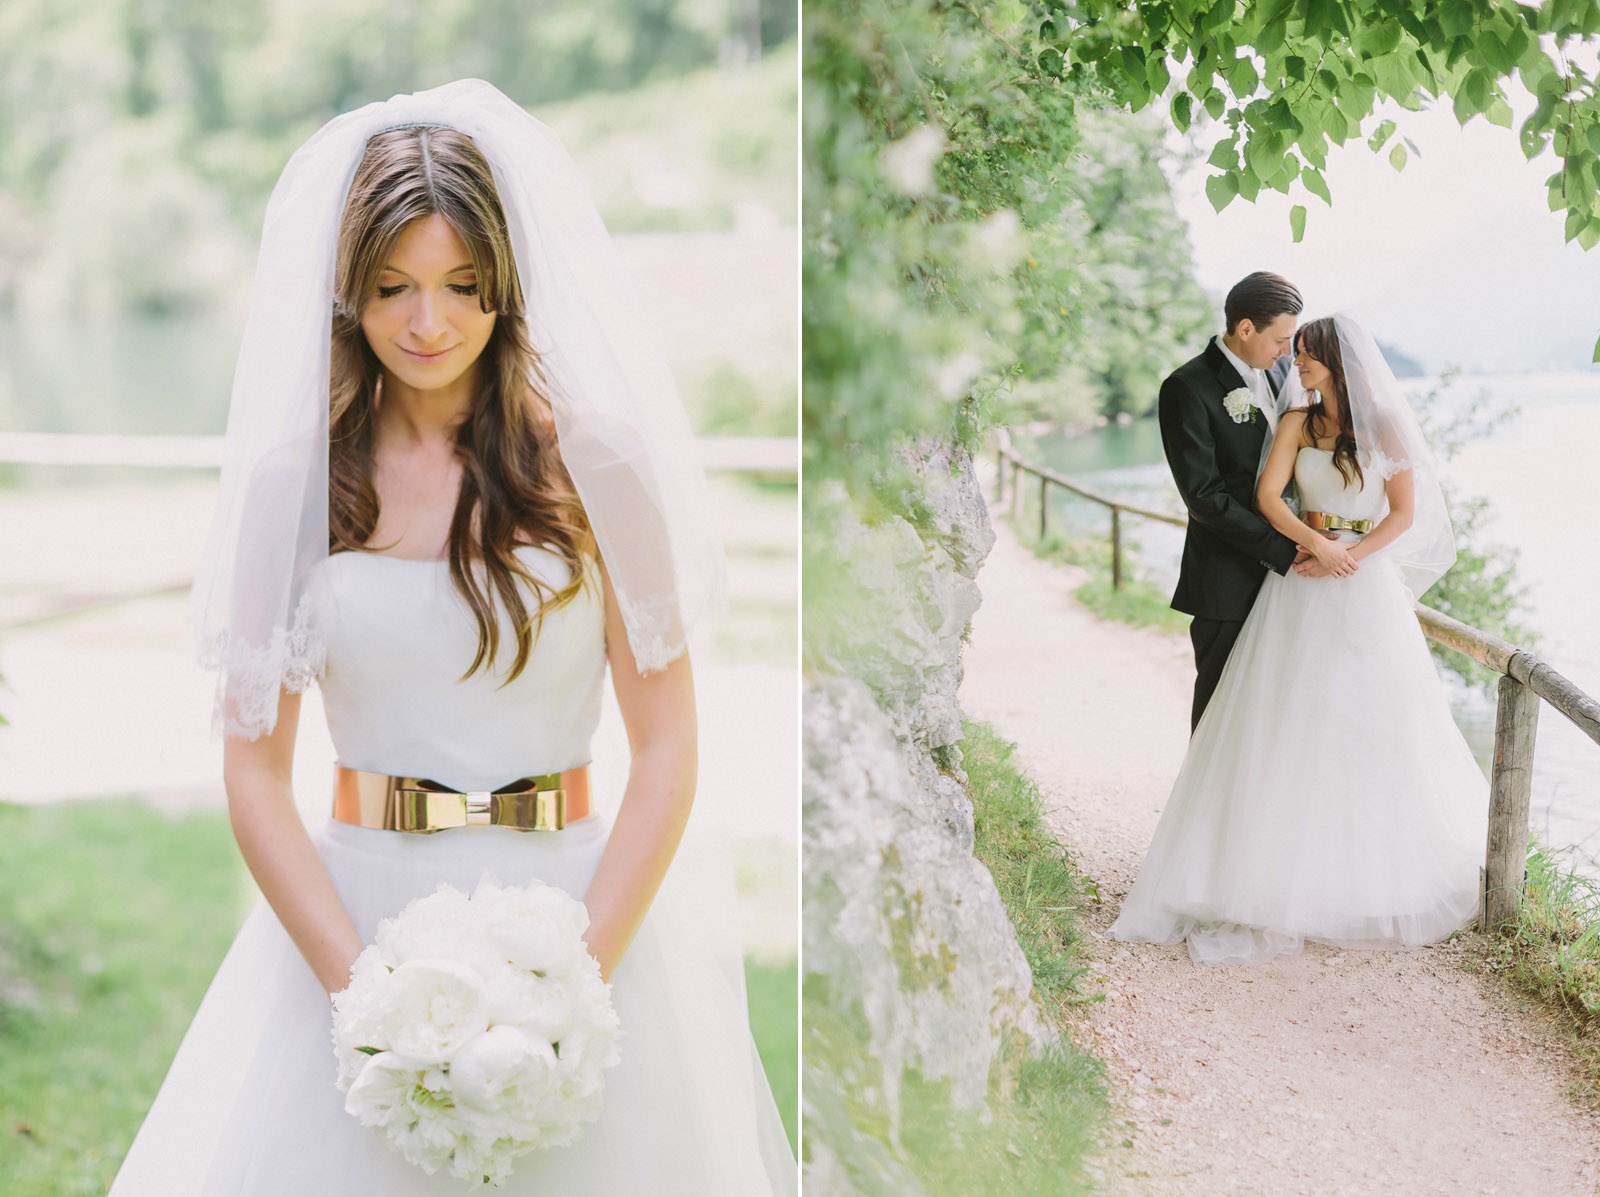 019-ladybird-wedding-dress